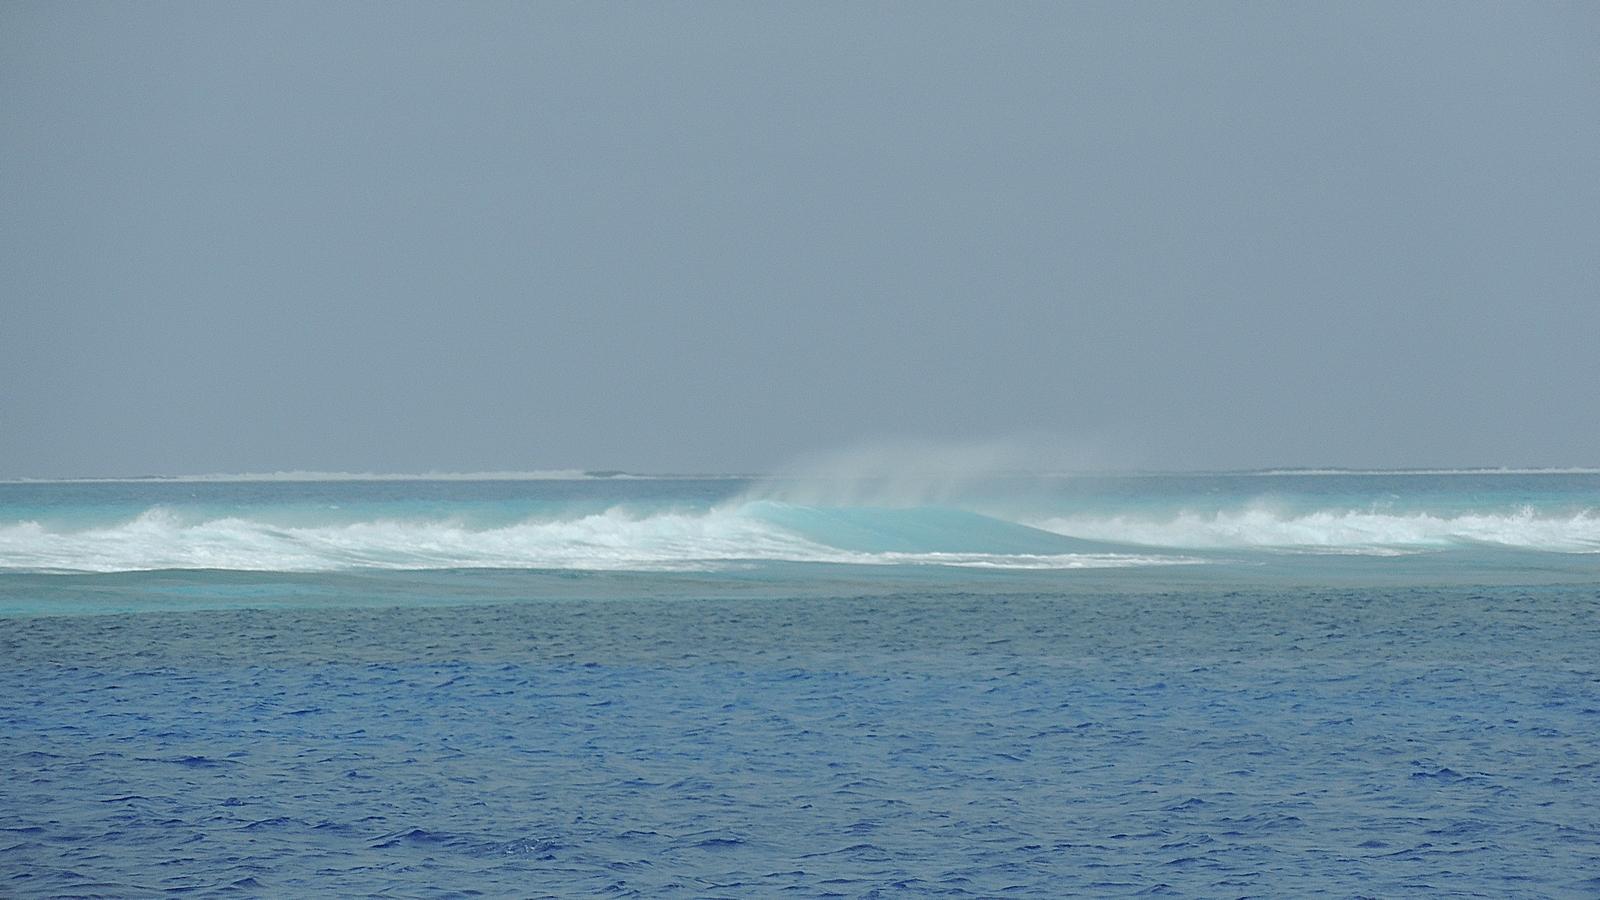 Beveridge Reef si vedono solo i frangenti